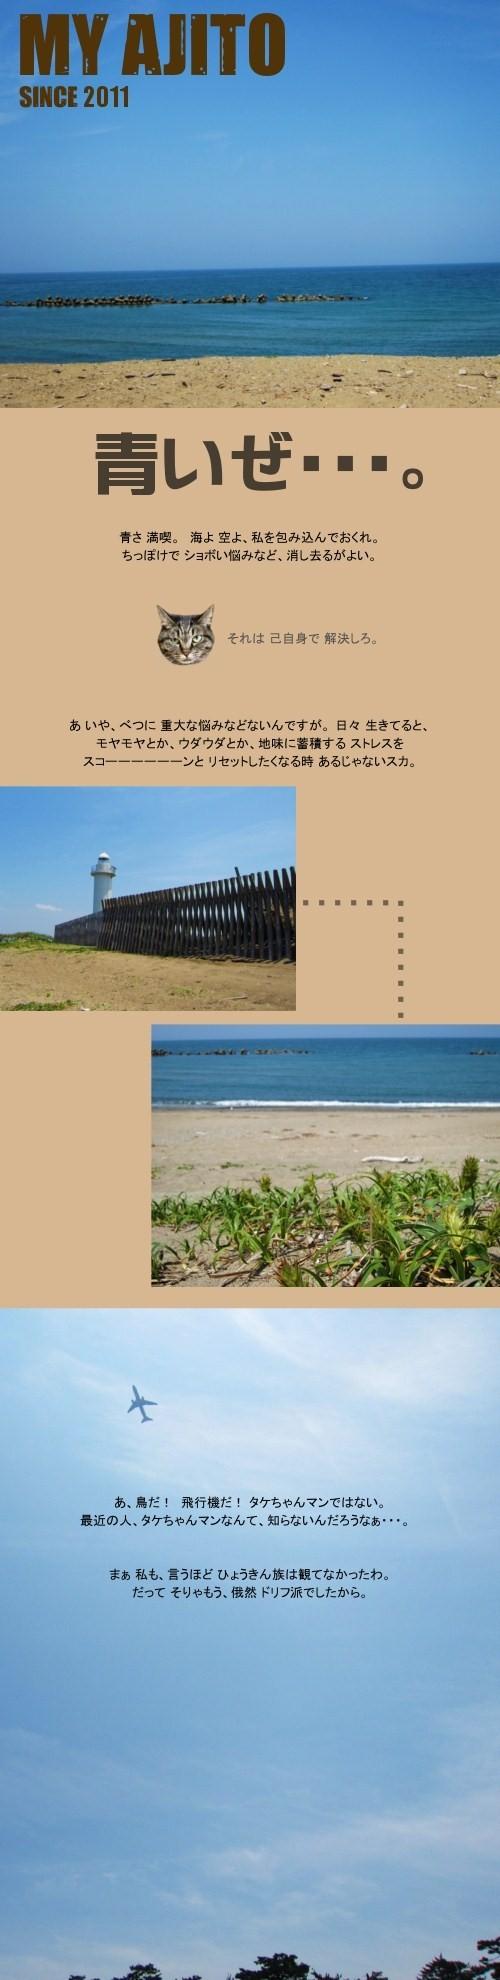 ryubo_2.jpg